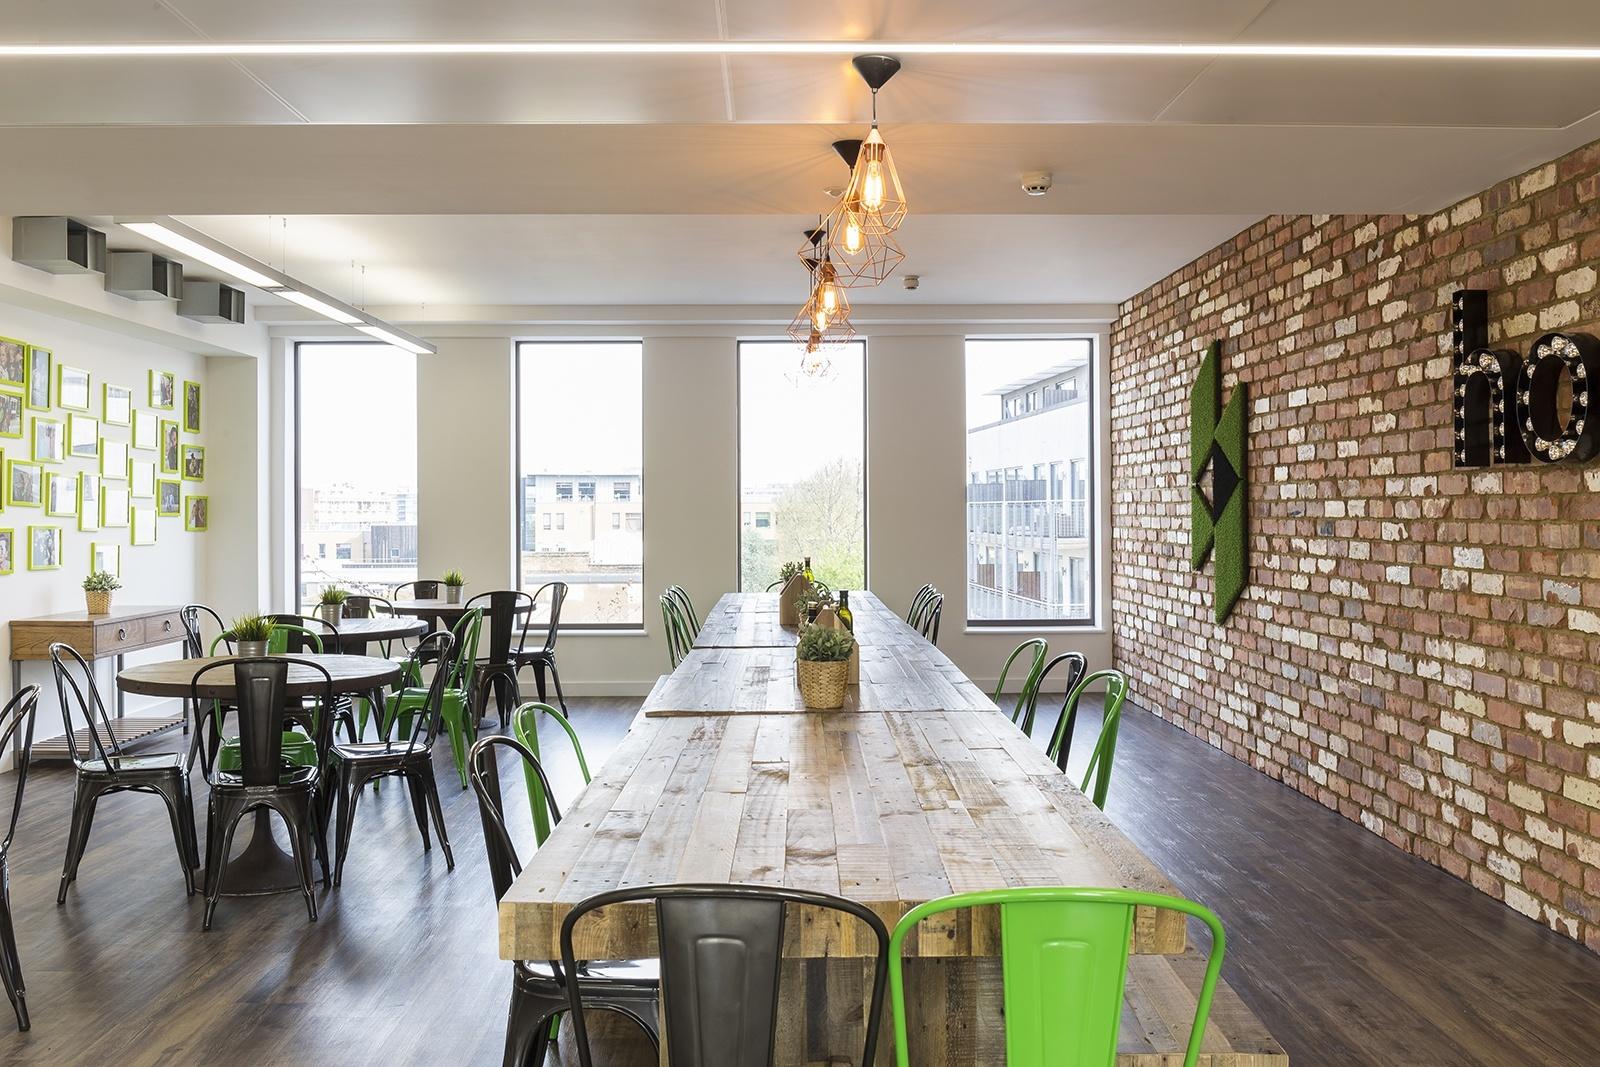 Charmant Houzz Interior Design For Offices · Tour Of European Headquarters    Officelovinu0027